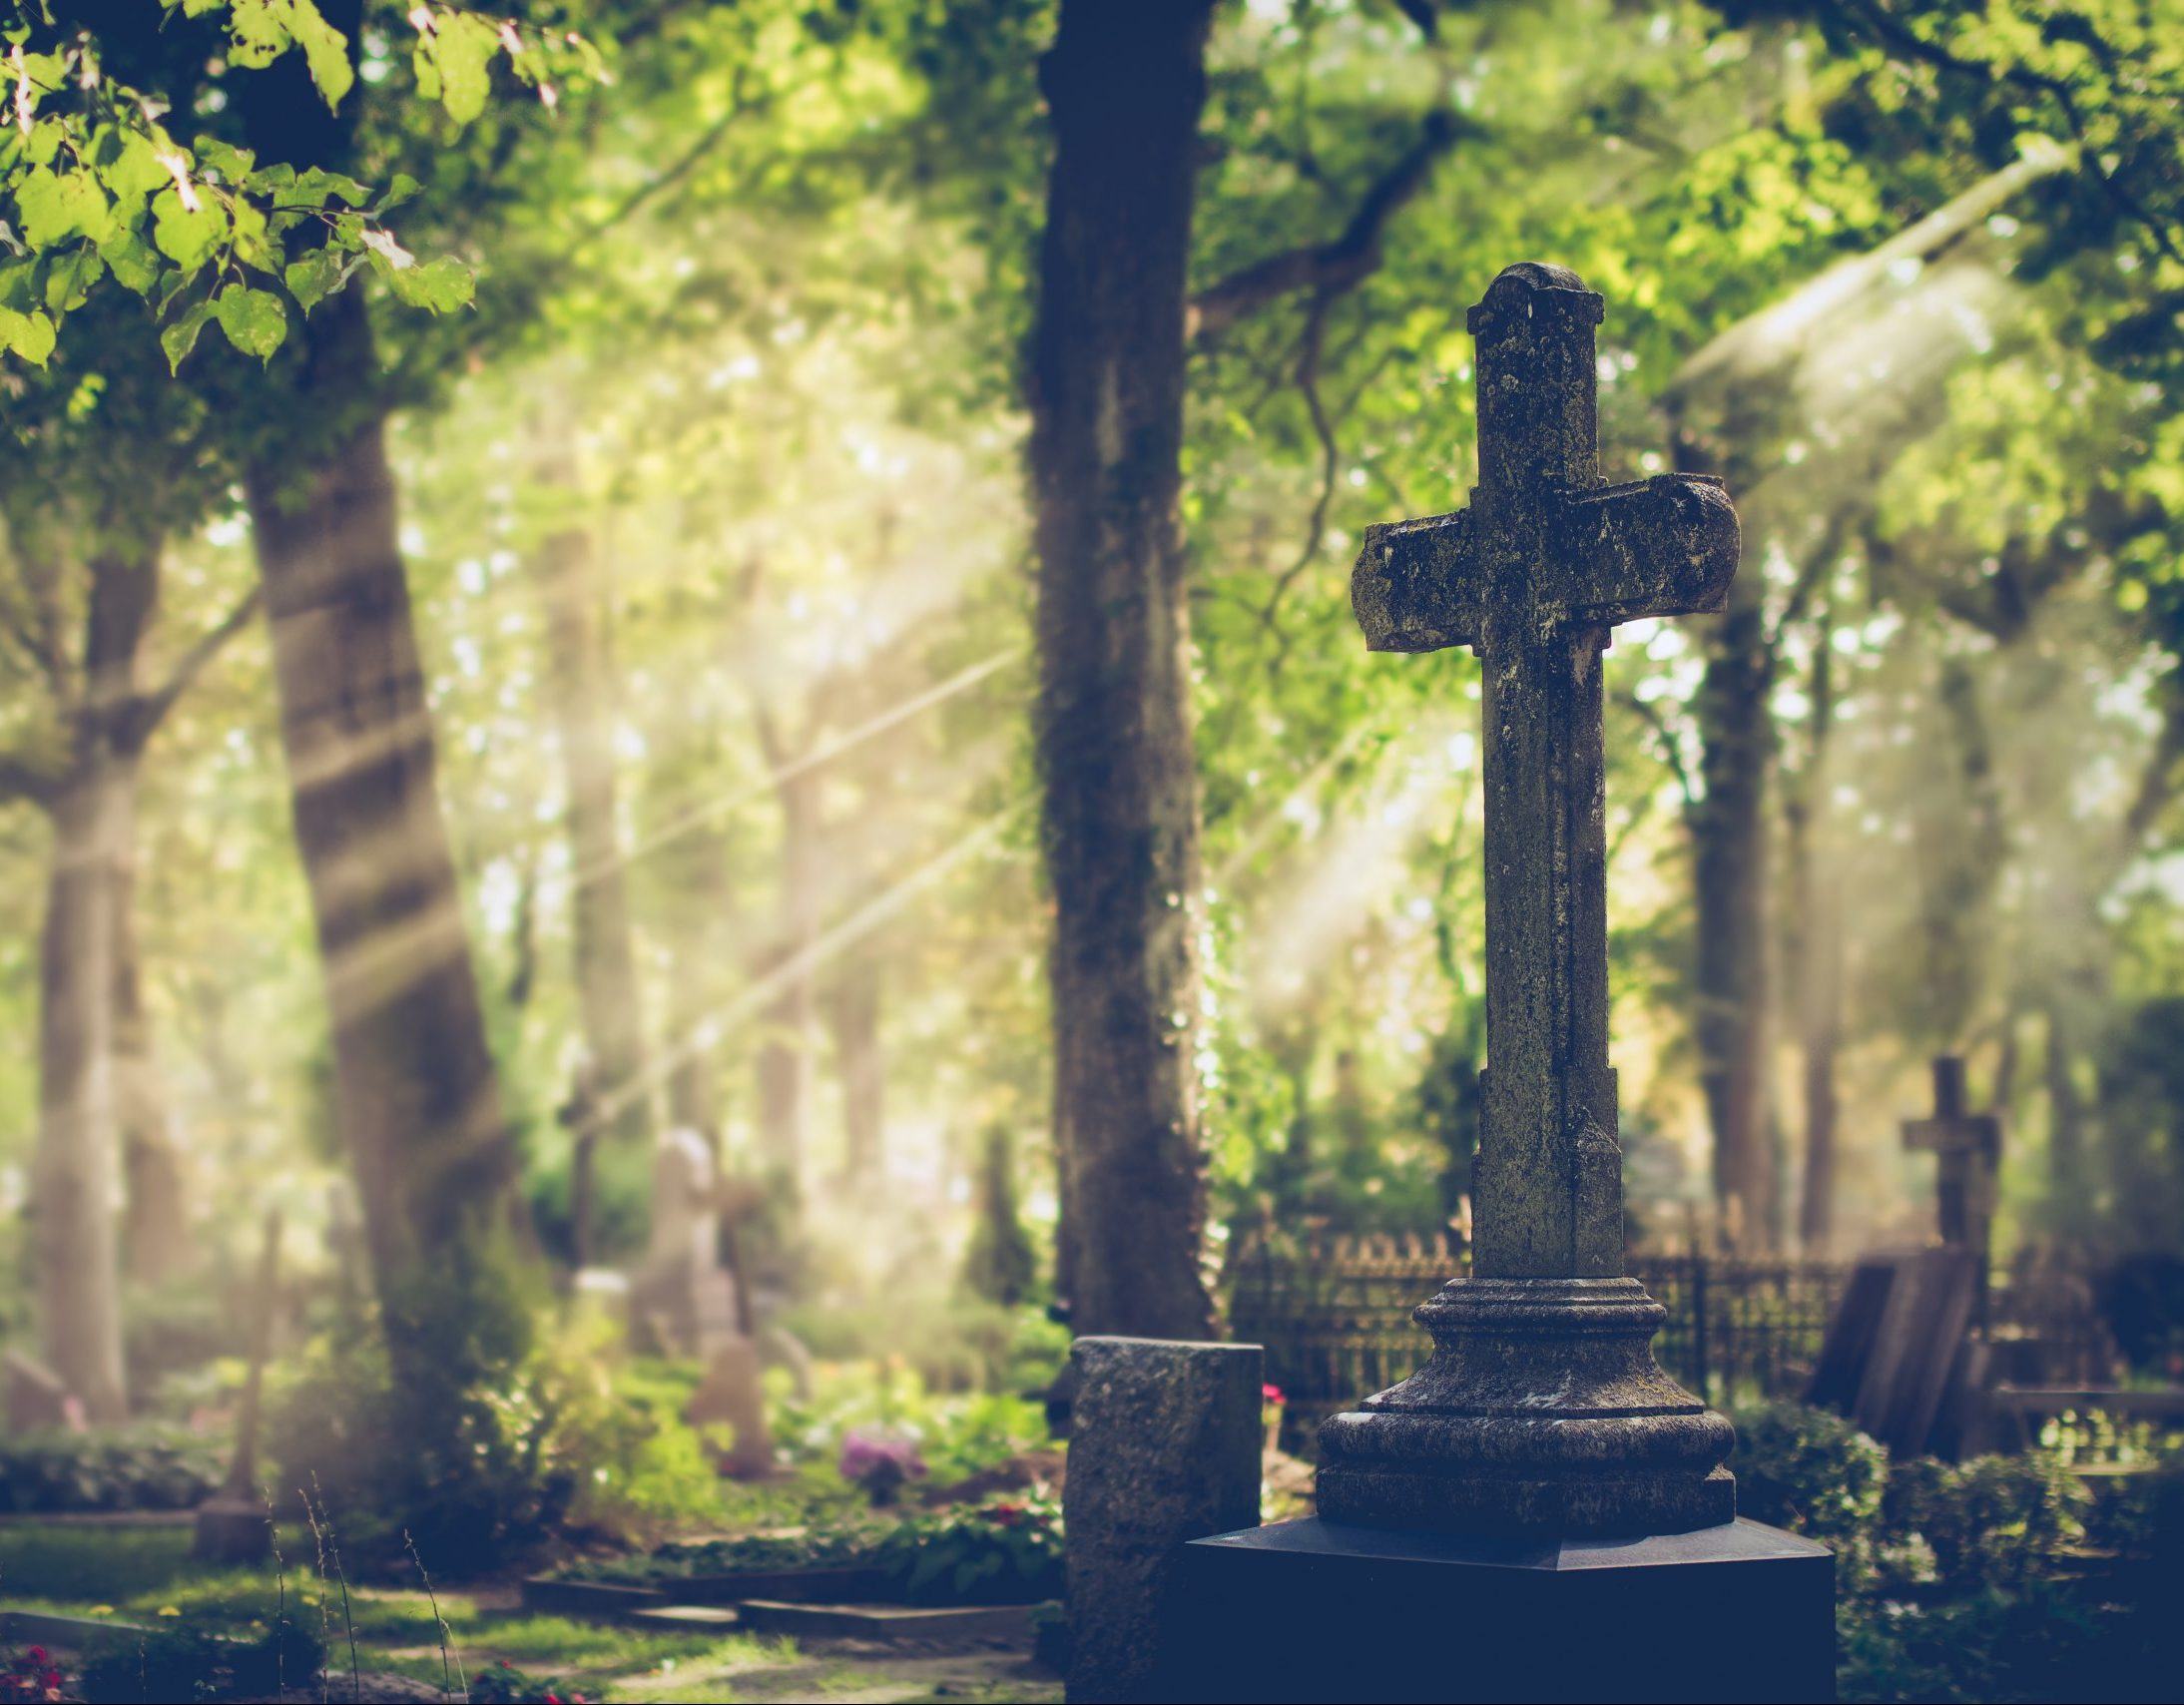 Friedhof: Ein Friedhof im Wald.